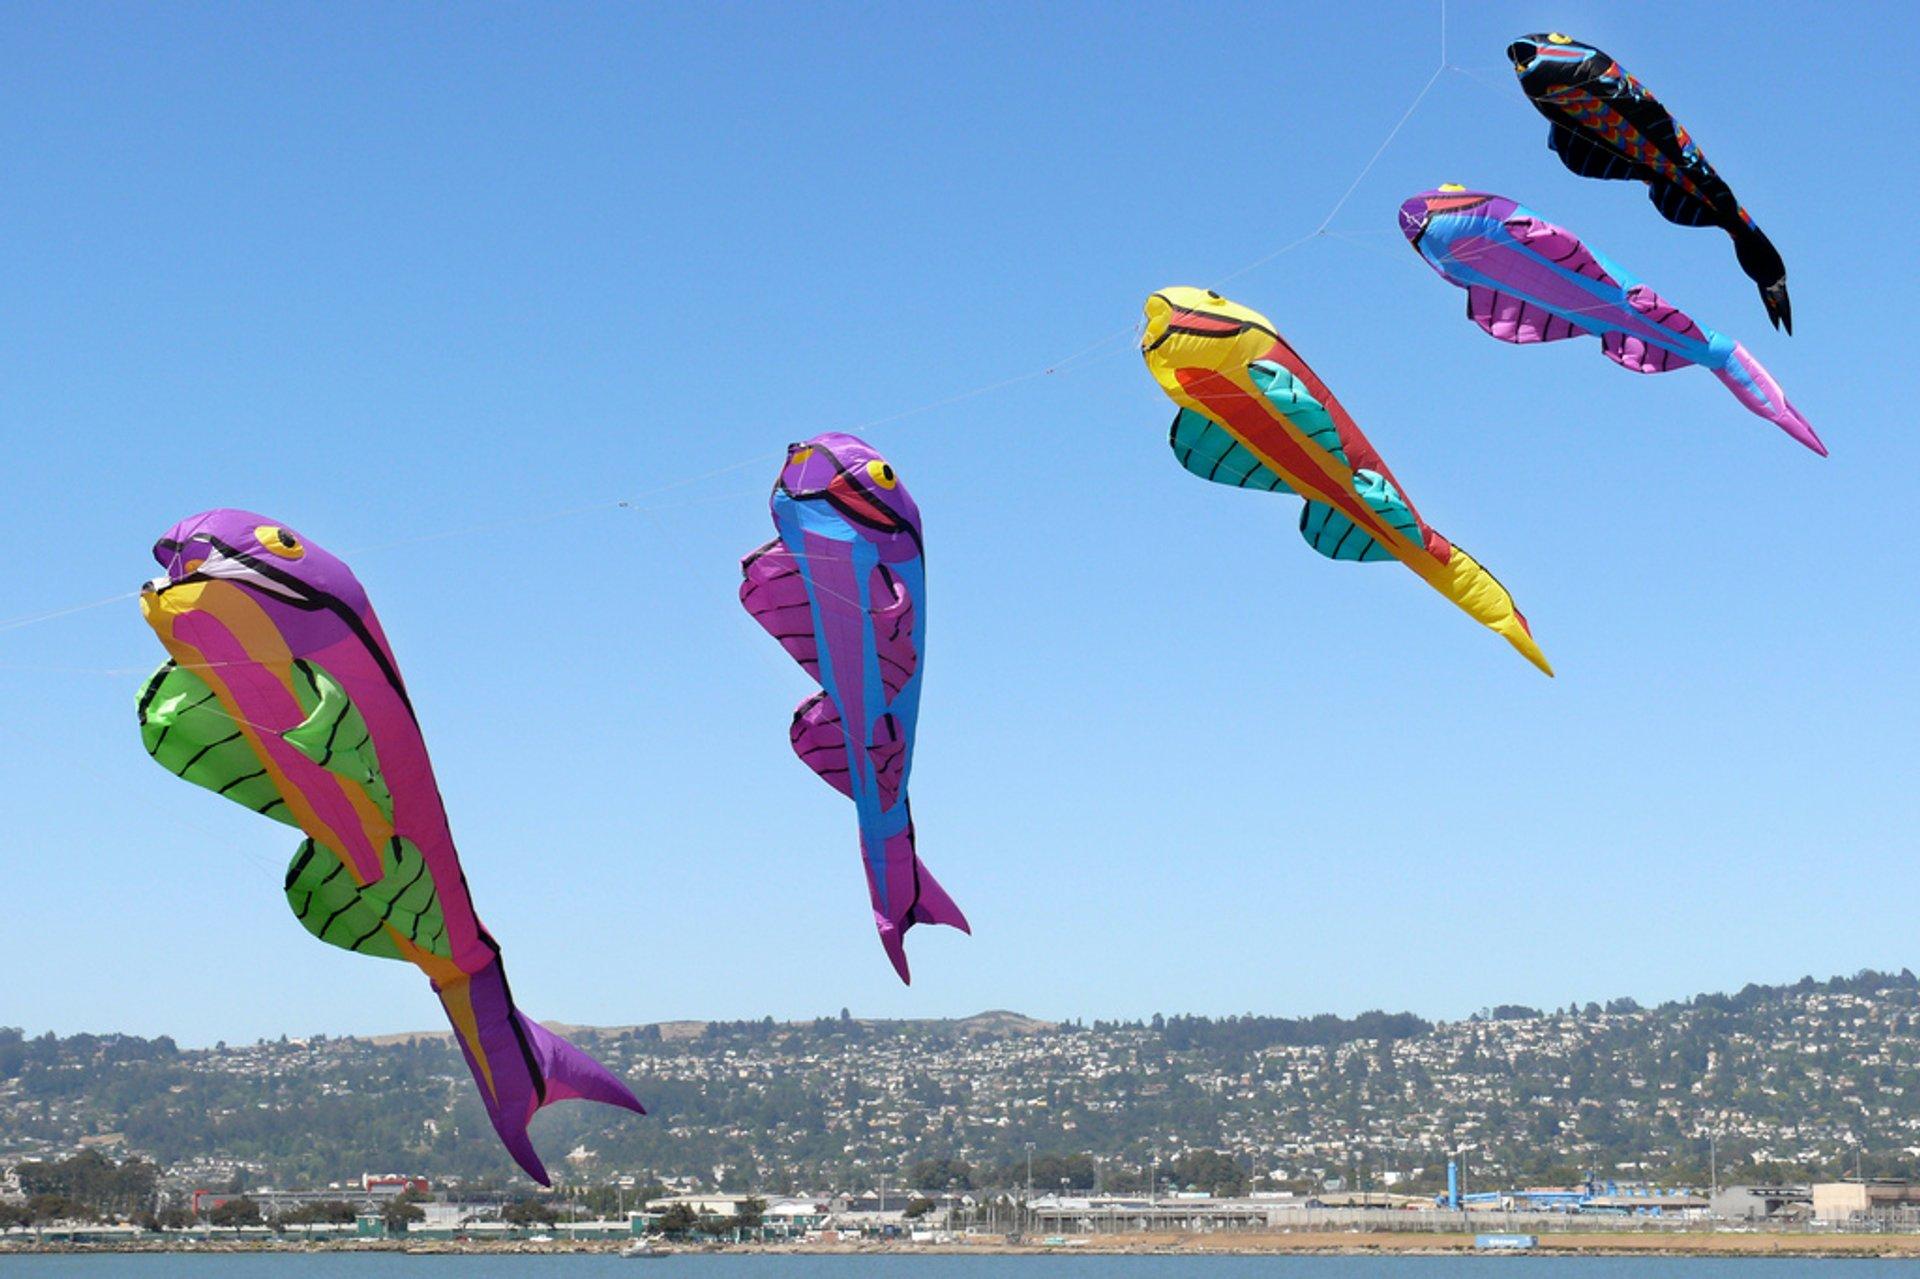 Berkeley Kite Festival in San Francisco - Best Season 2020